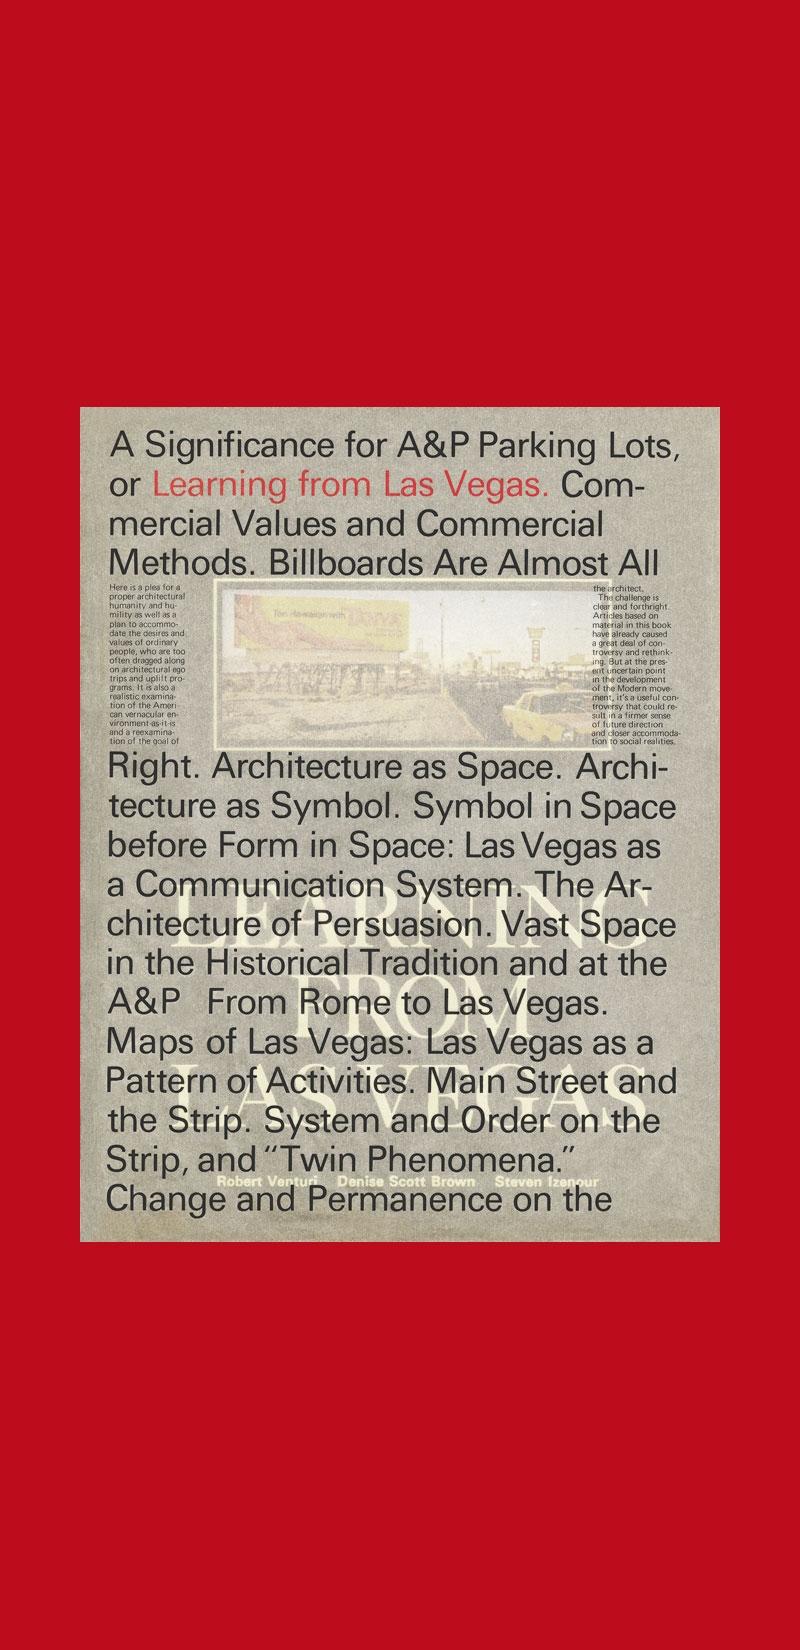 Venturi, Scott Brown, Izenour: Learning from Las Vegas